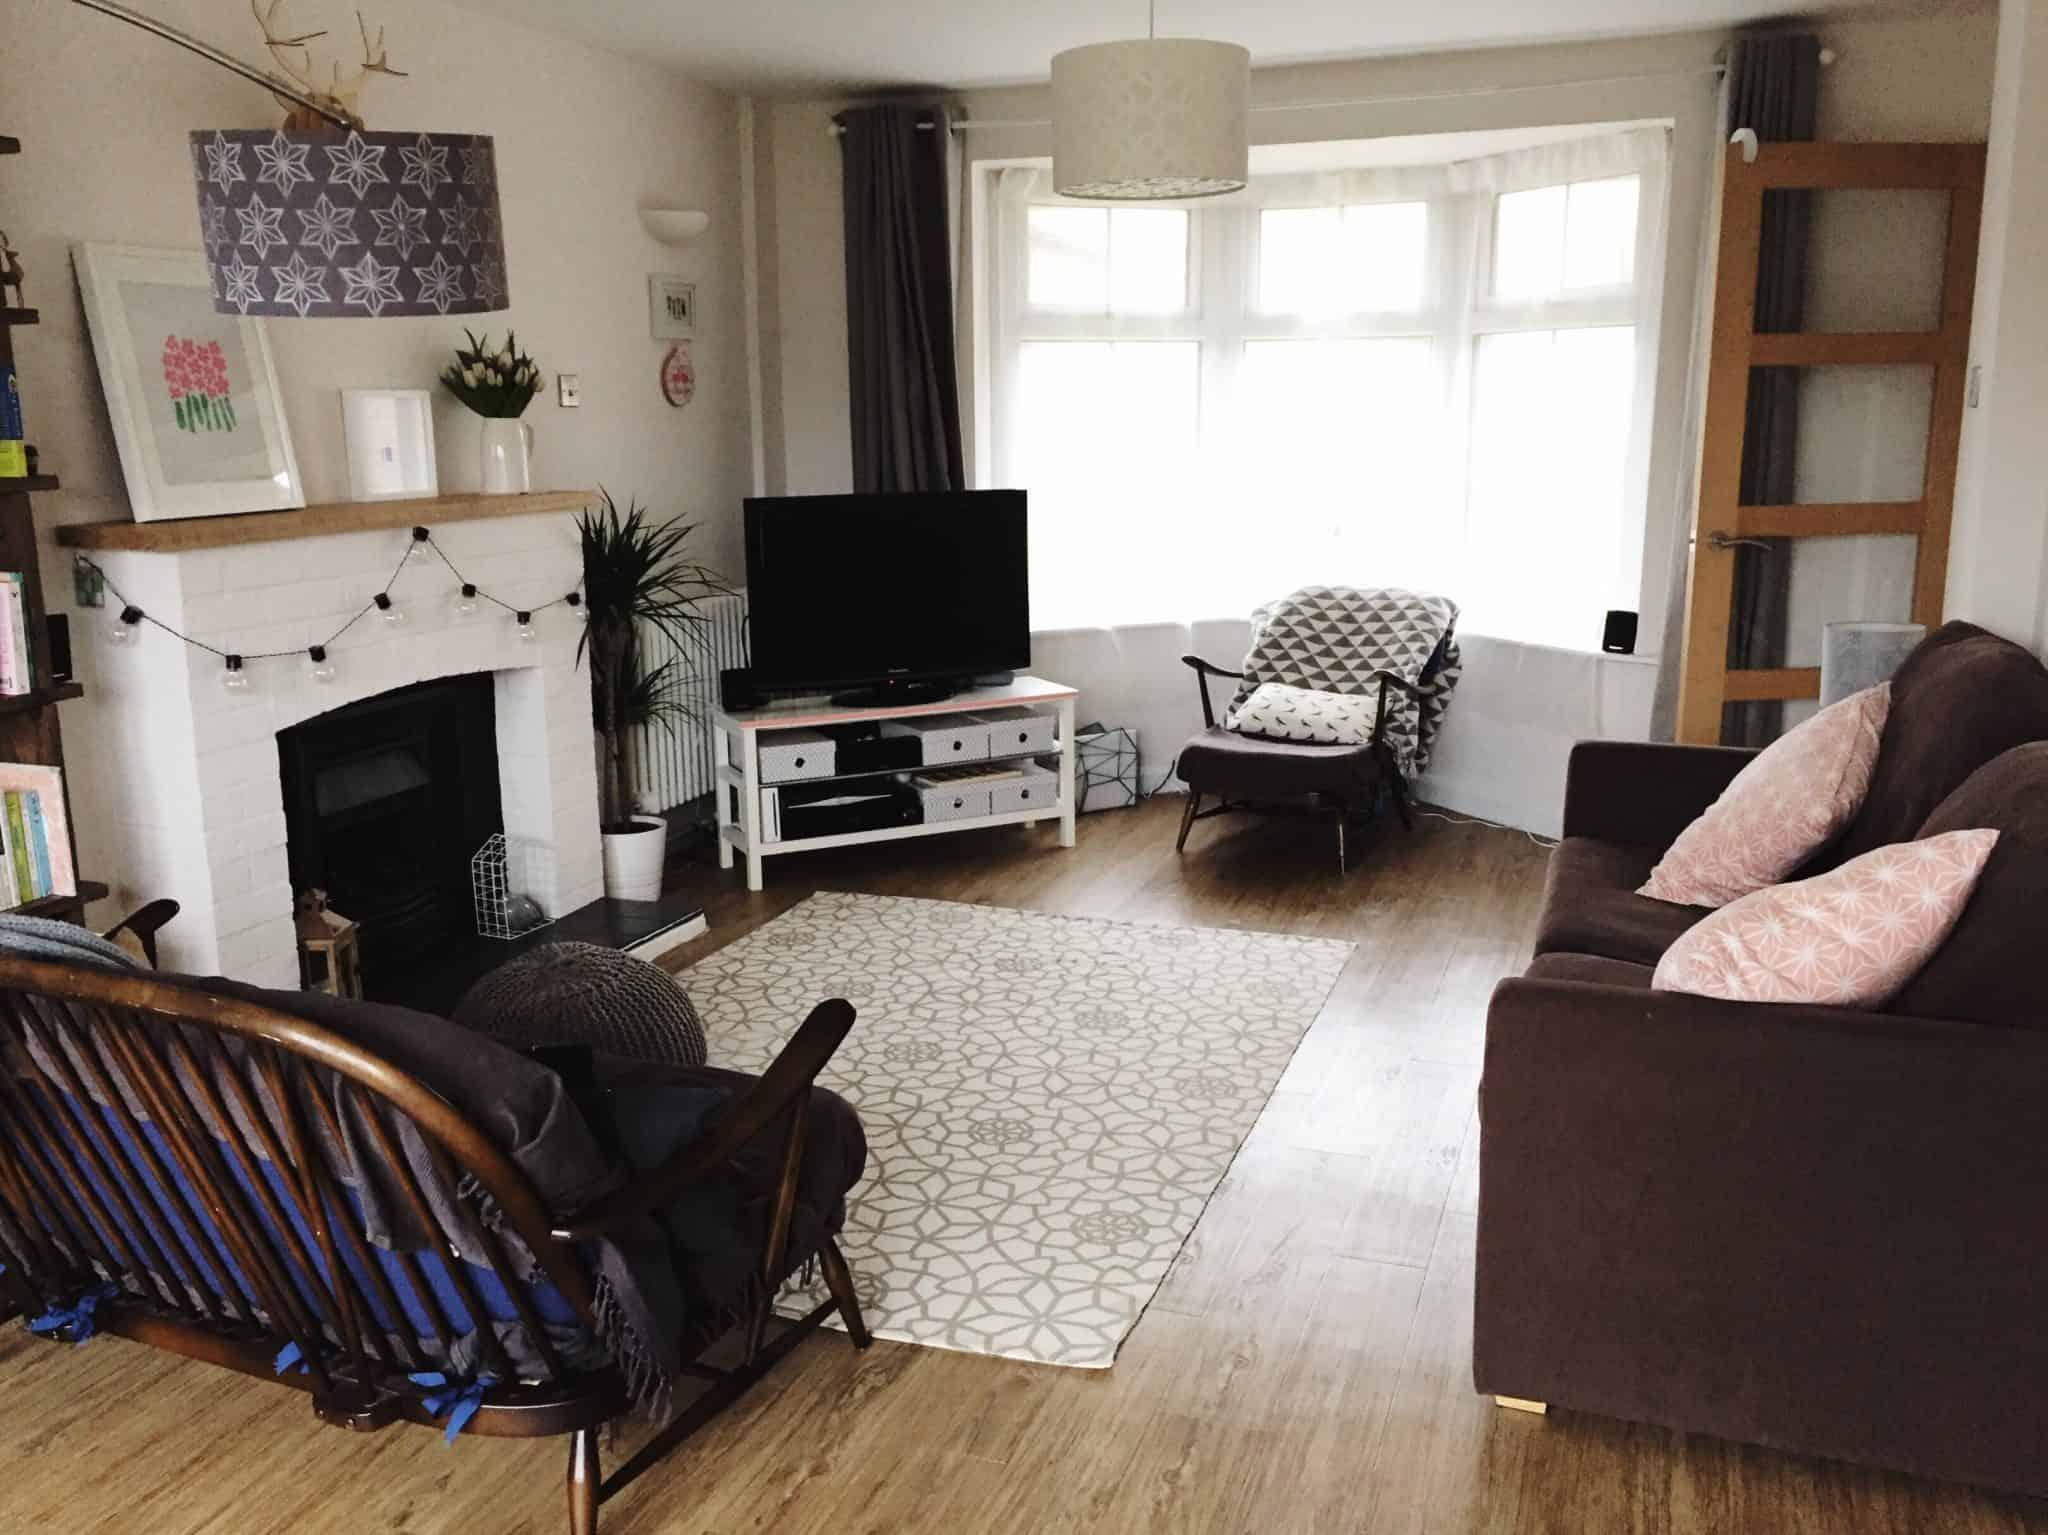 Before \u0026 After: Our Grey \u0026 White Lounge Needs A New Sofa & Before \u0026 After: Our Grey \u0026 White Lounge Needs A New Sofa | PinksCharming